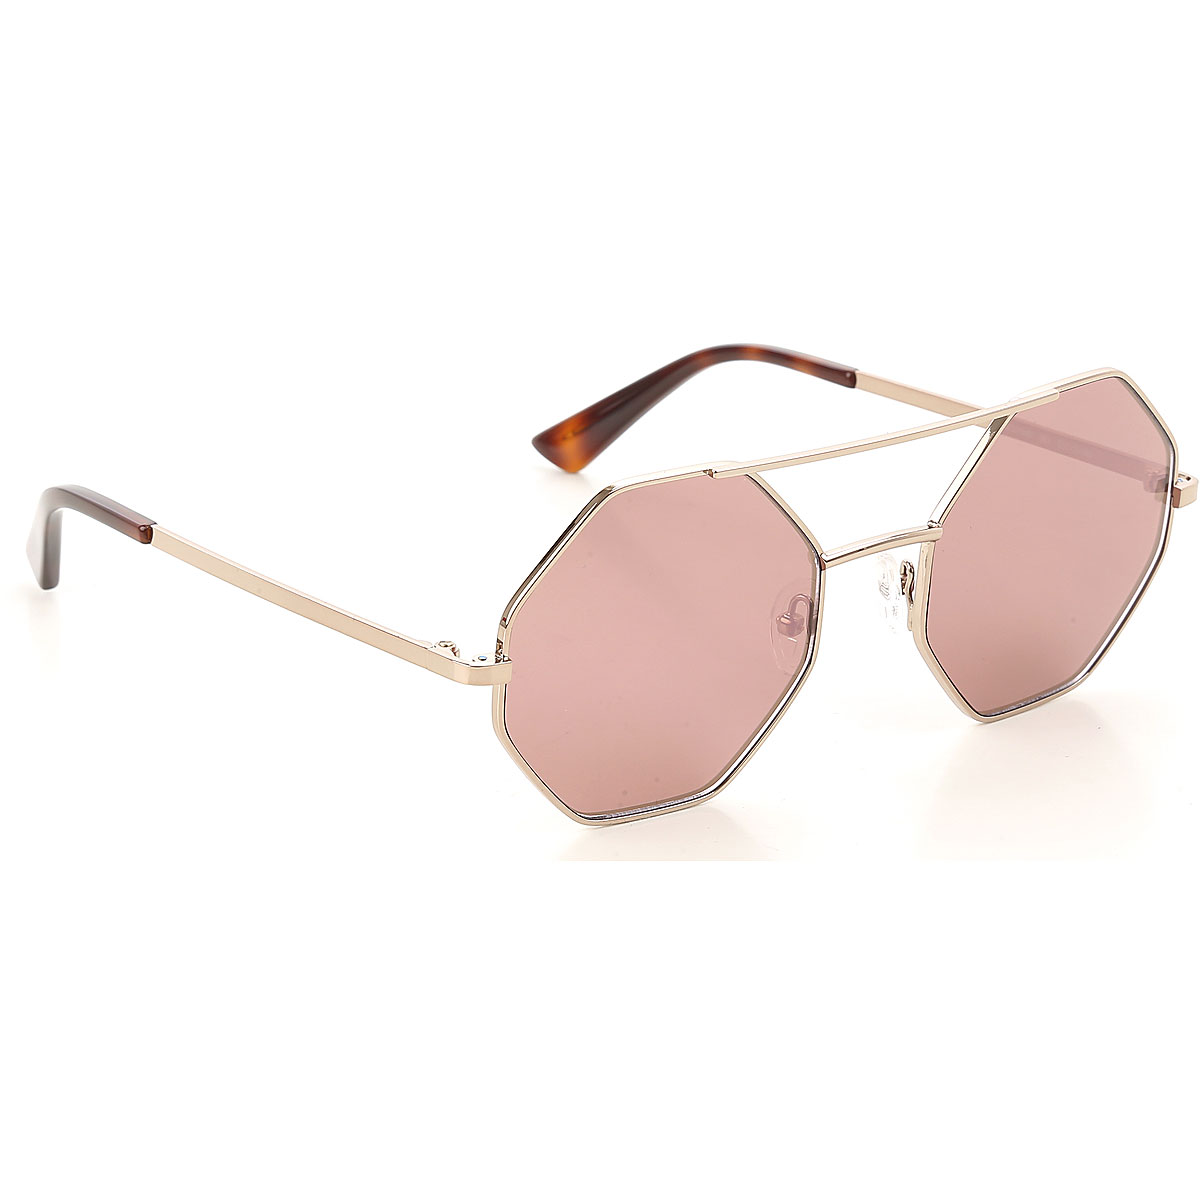 Alexander McQueen McQ Sunglasses On Sale, Gold Rose, 2019